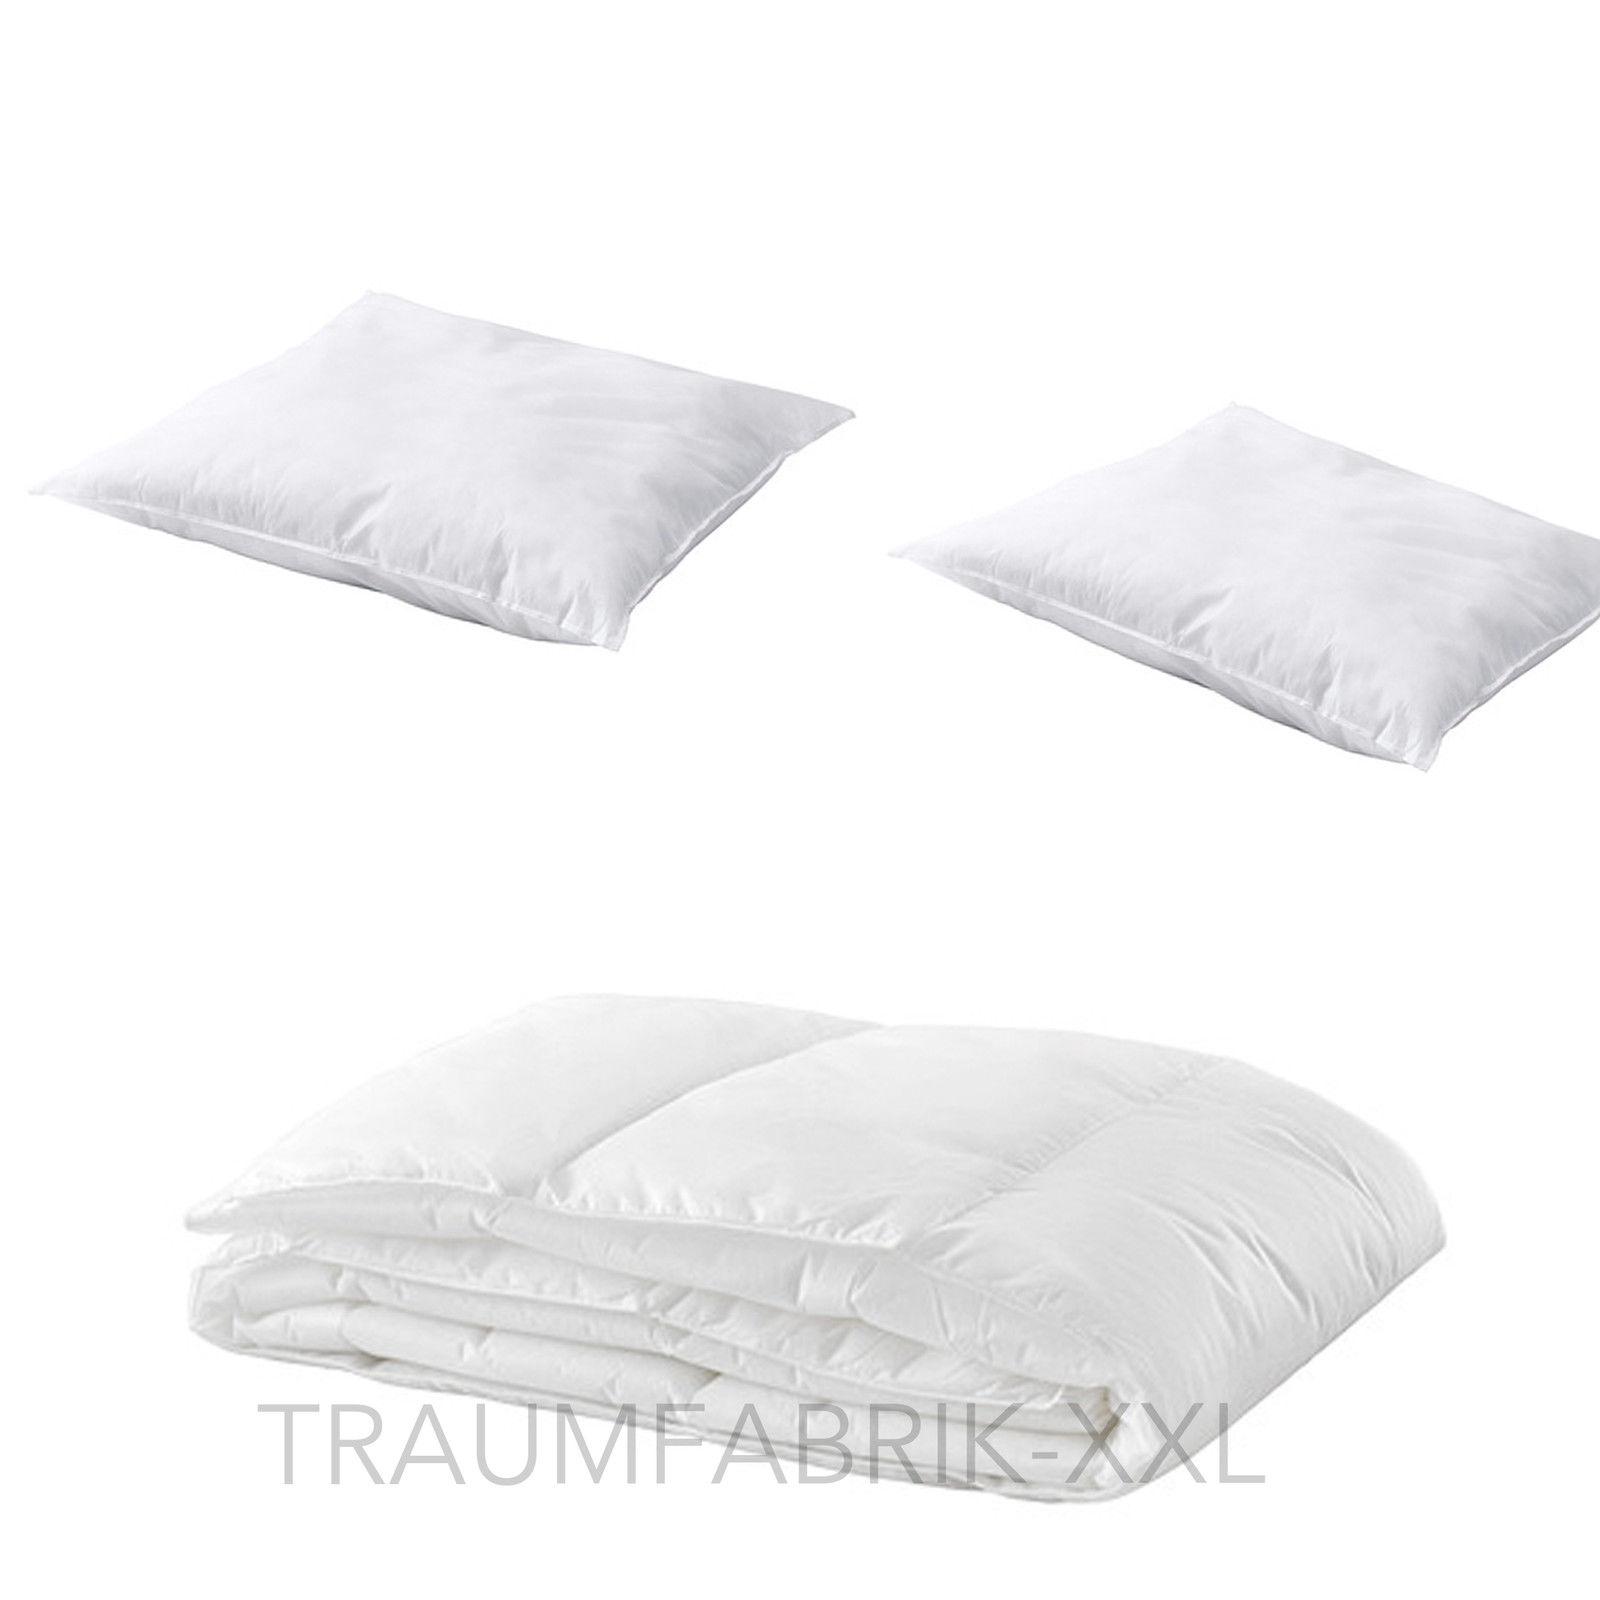 3 fach bettenset 1 bettdecke 140 200 cm 2 kopfkissen 80 80 cm ikea bettzeug traumfabrik xxl. Black Bedroom Furniture Sets. Home Design Ideas